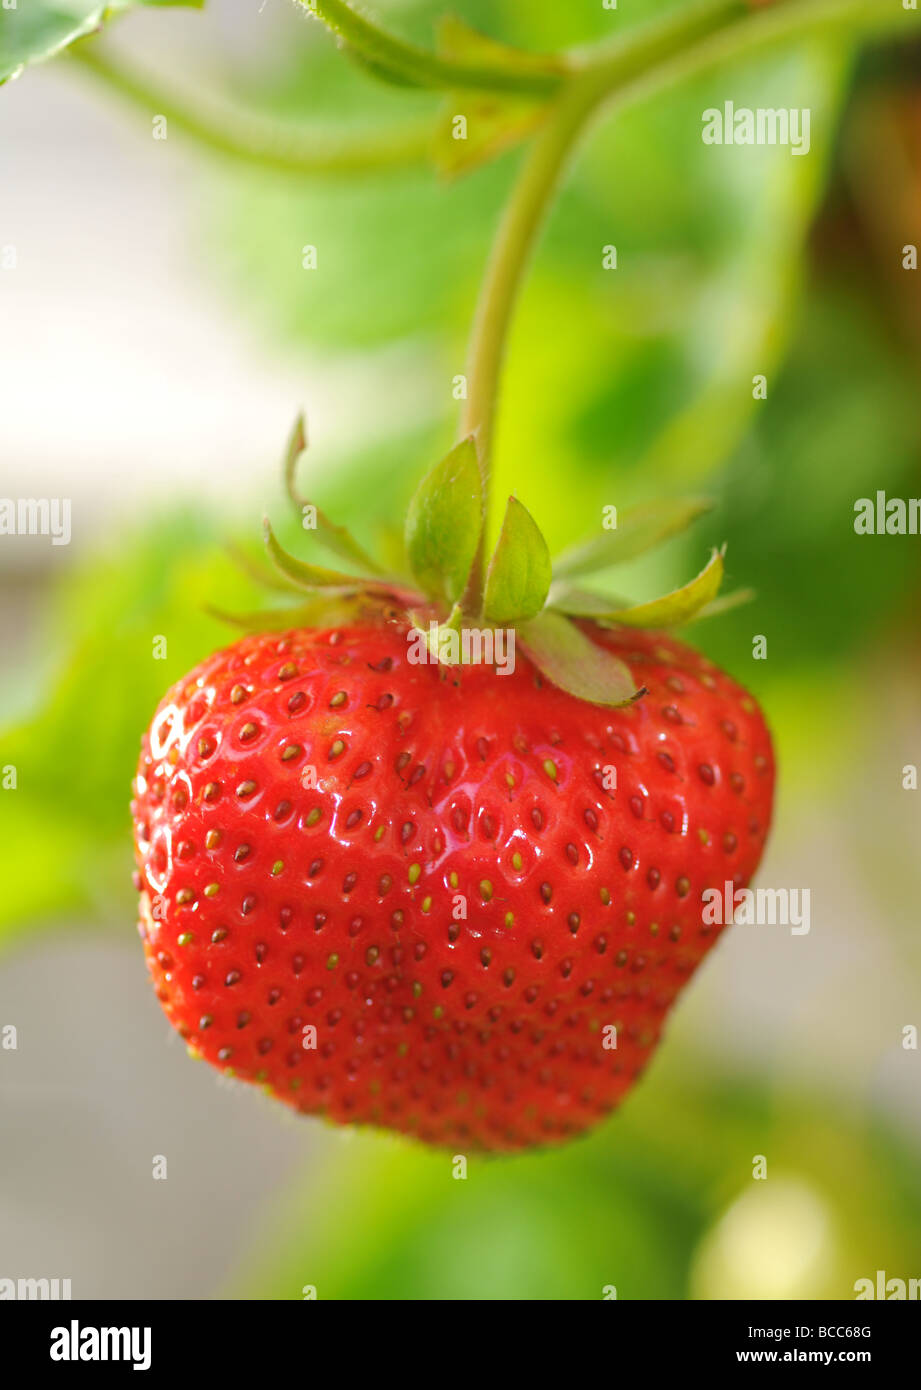 Strawberry, strawberries - Stock Image